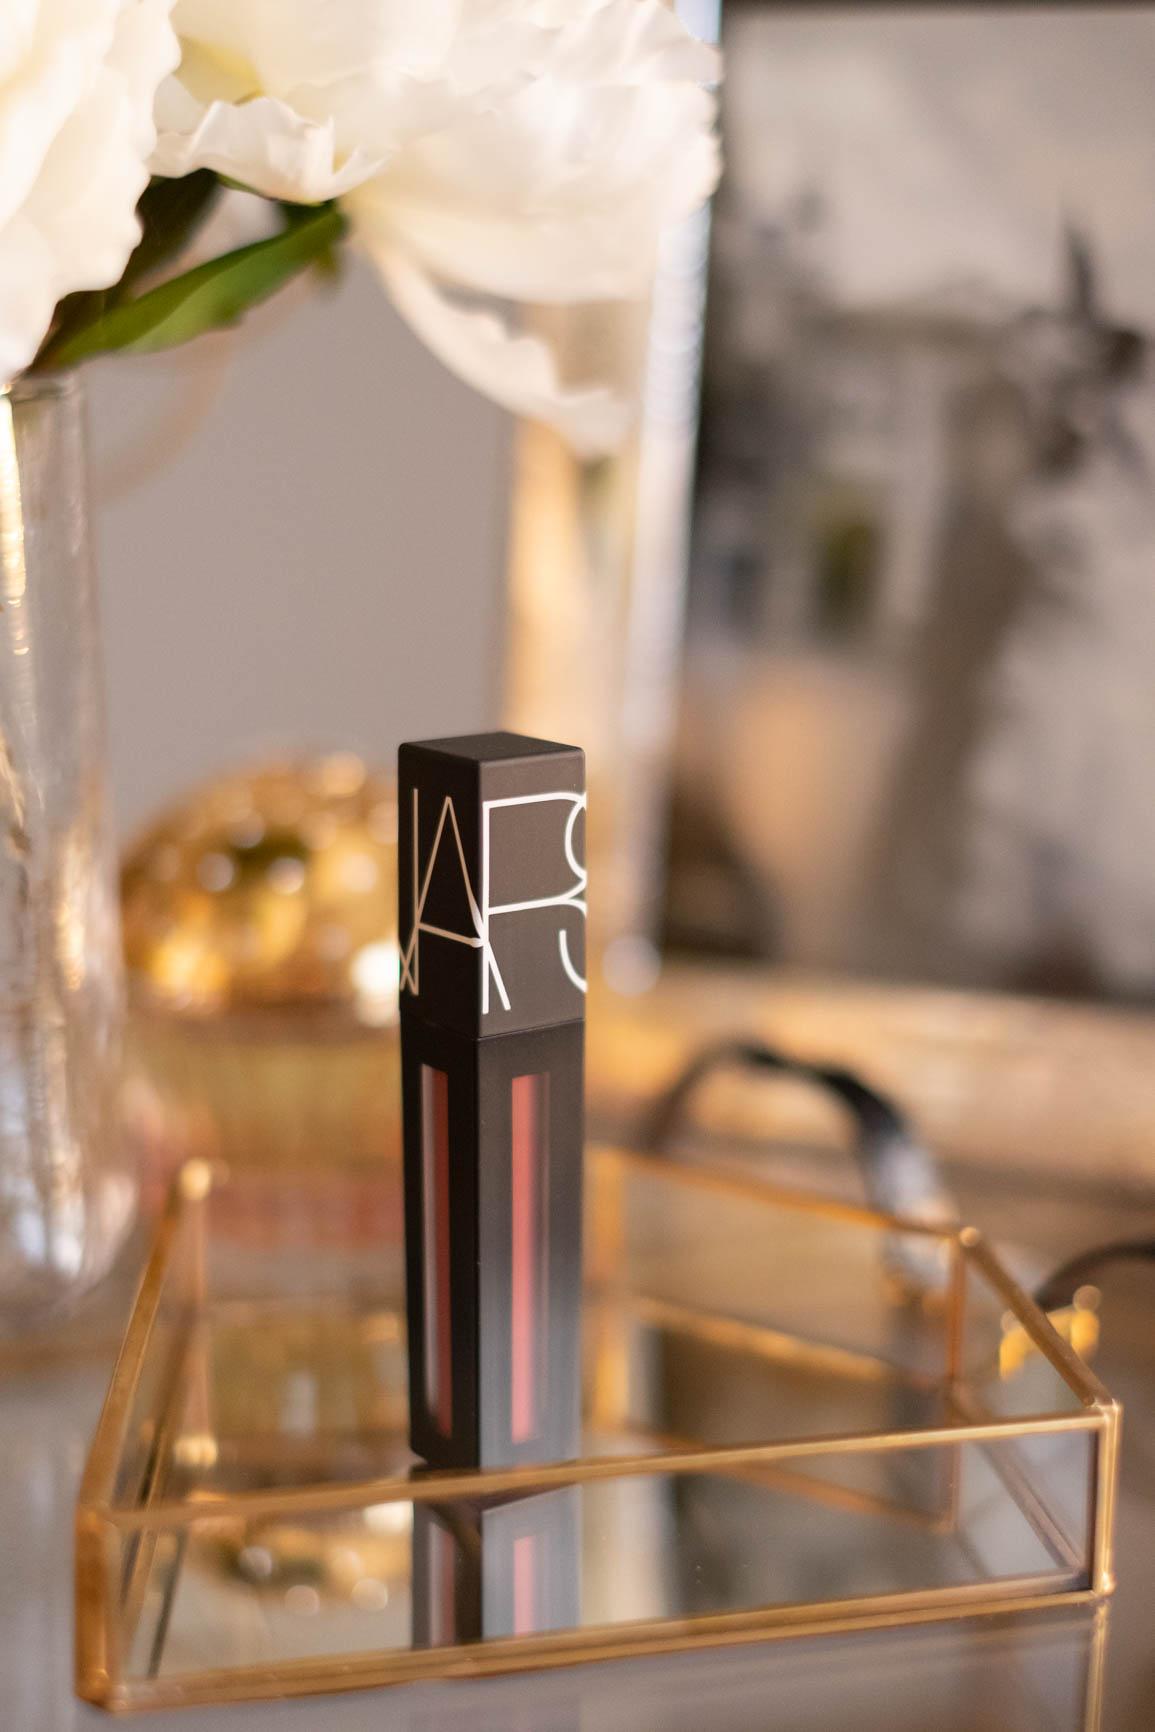 sunkissedblush-anastasia-beverly-hills-liquid-lipstick-nars-powermatte-lip-pigment-6